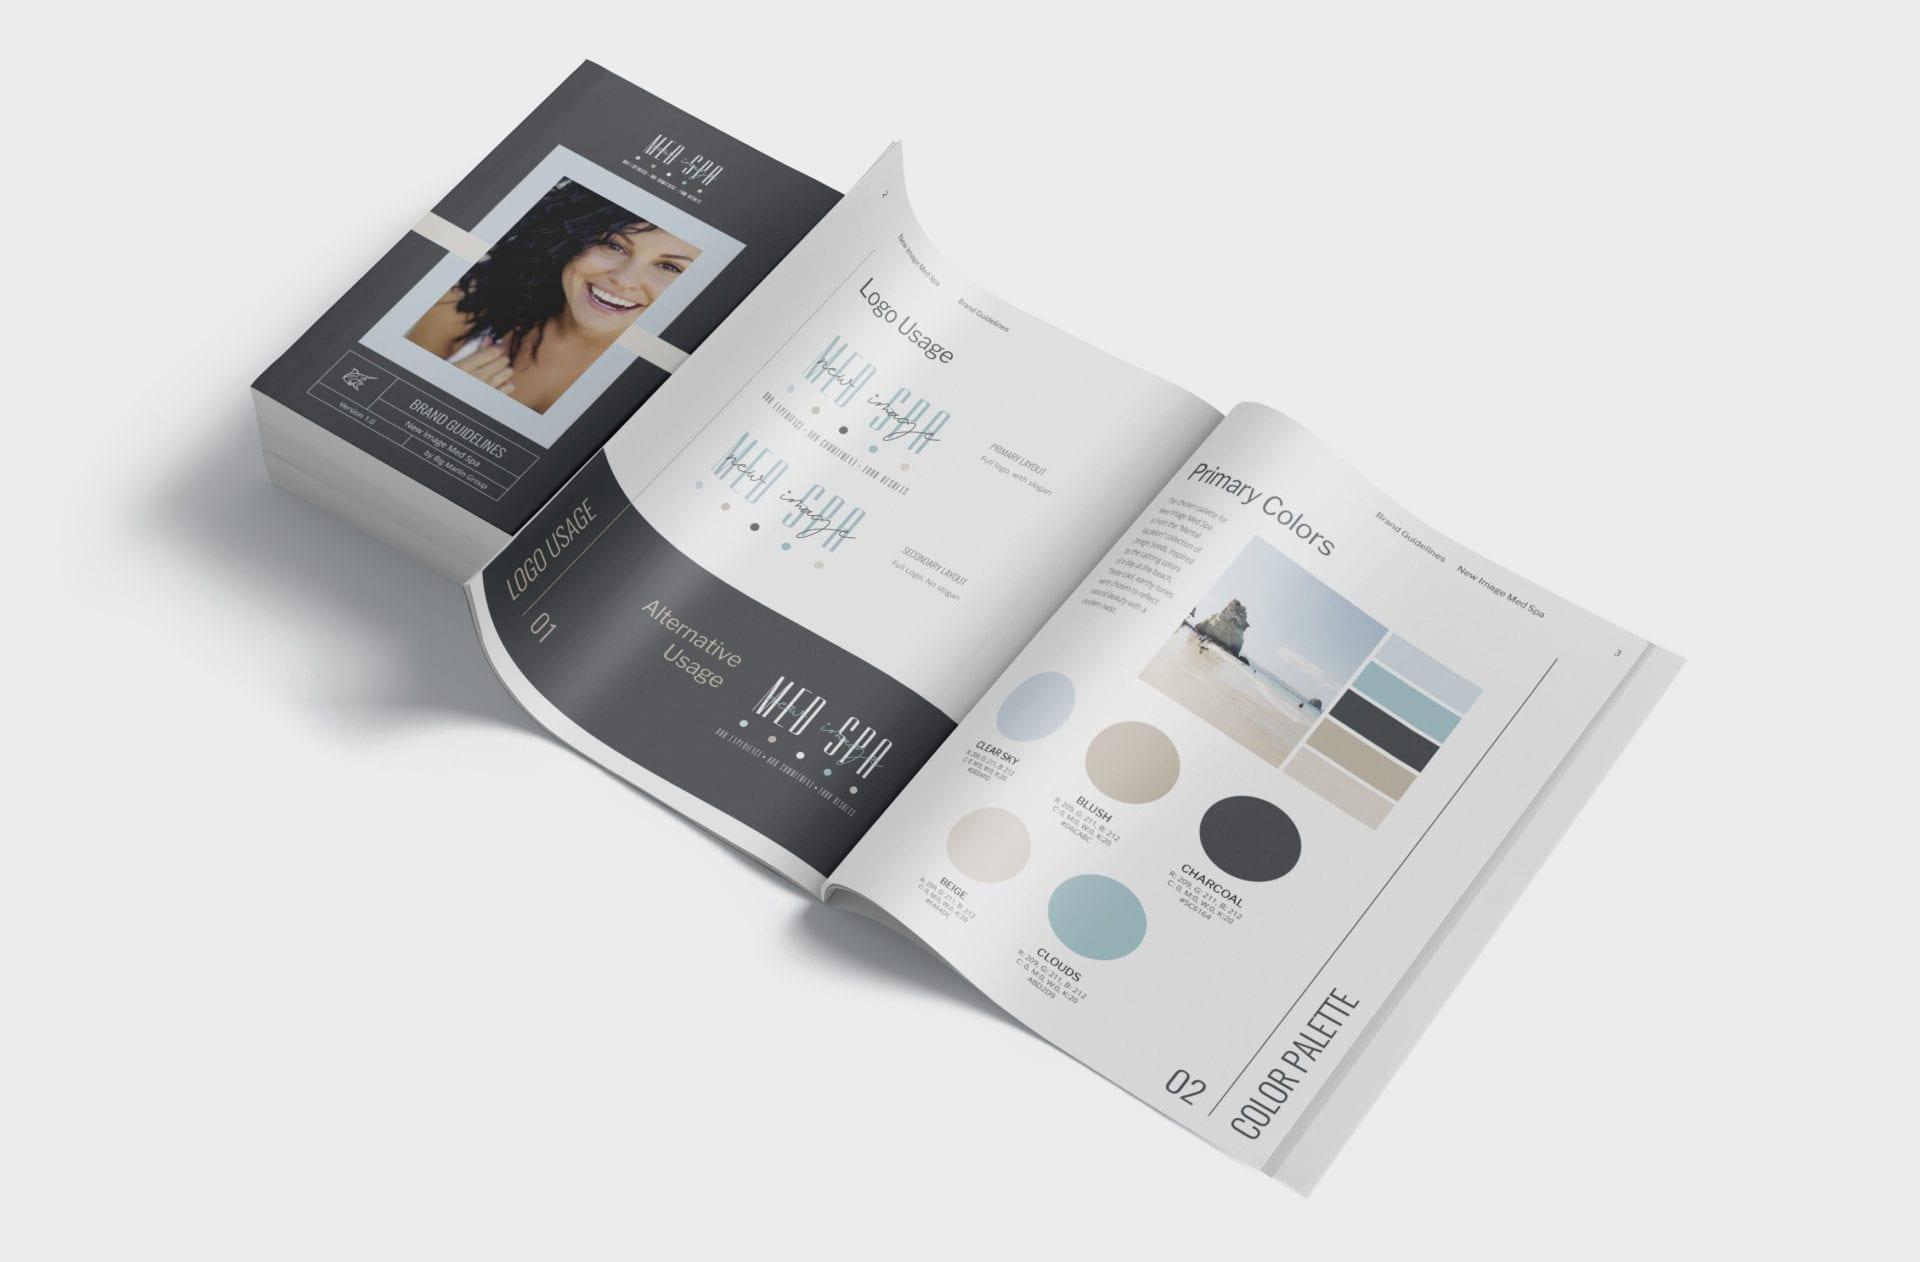 New Image Med Spa Brand Guidelines